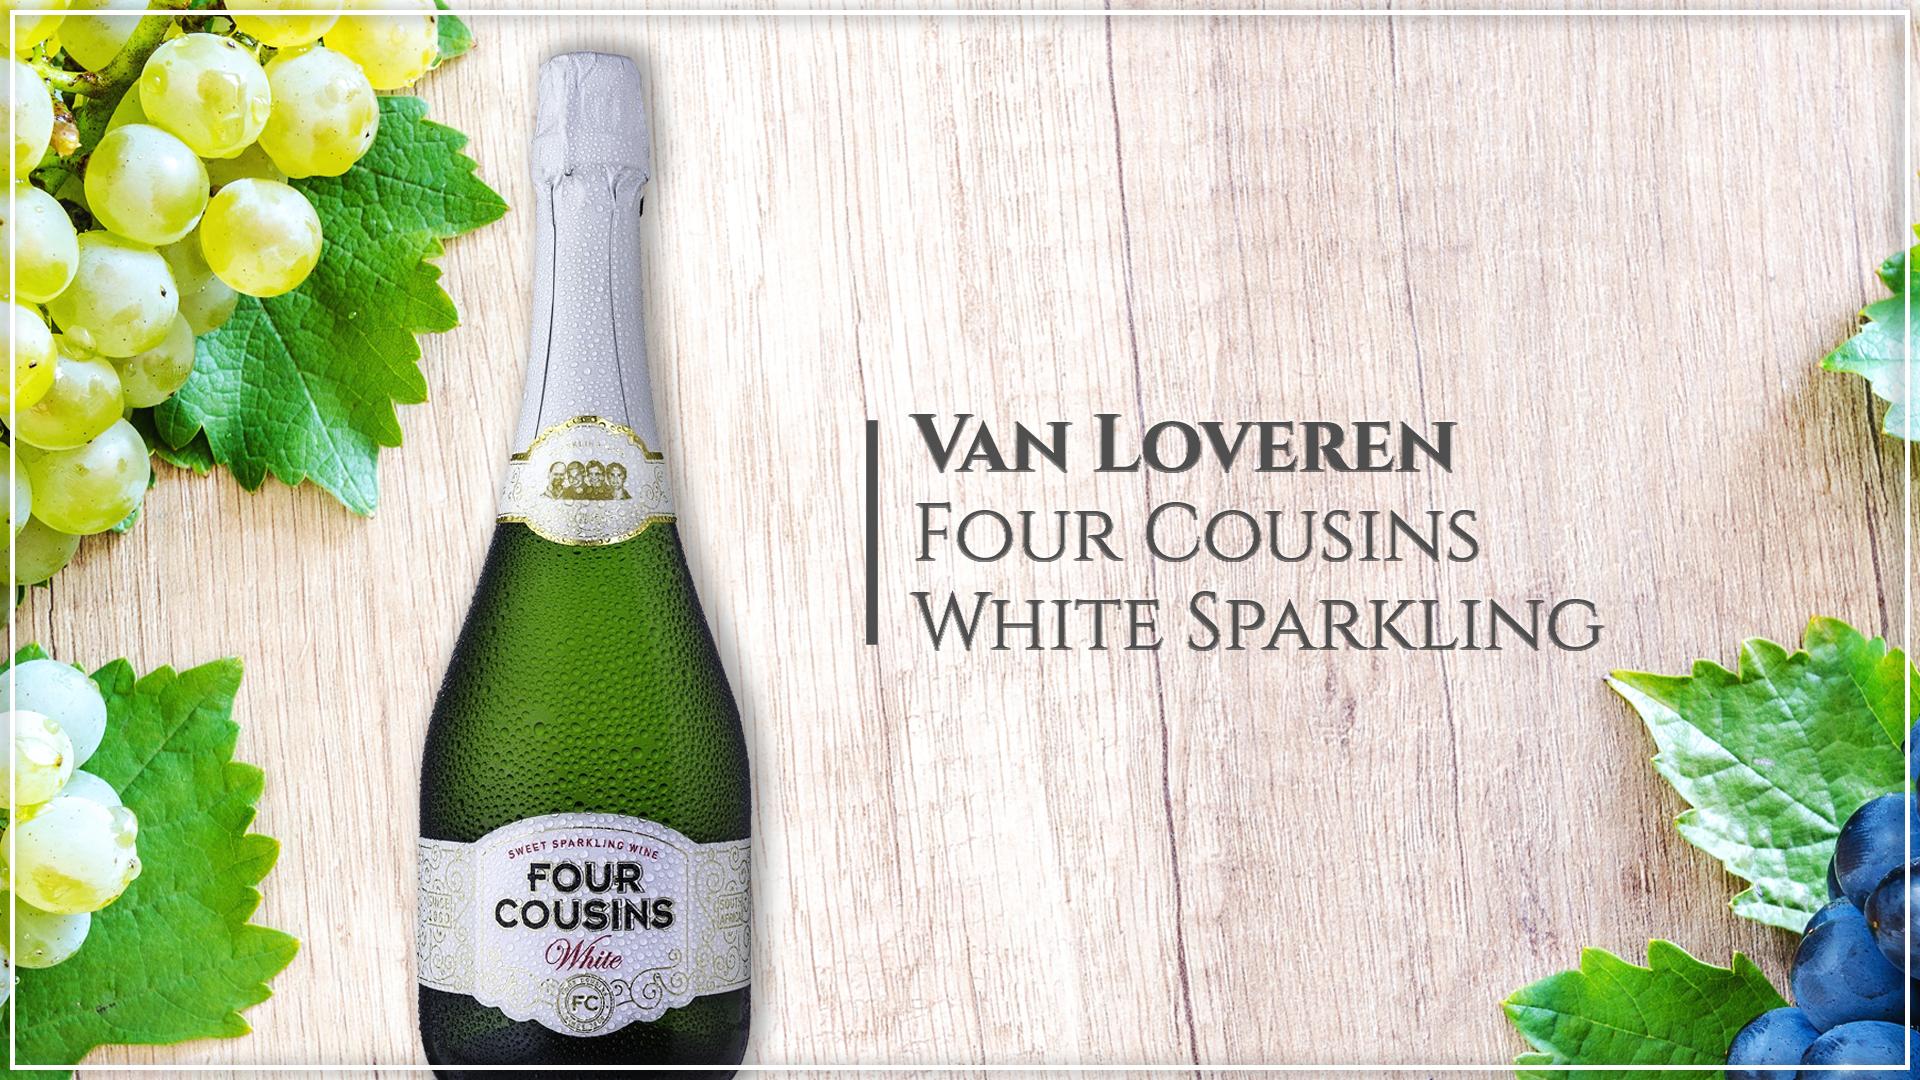 Van Loveren Four Cousins White Sparkling